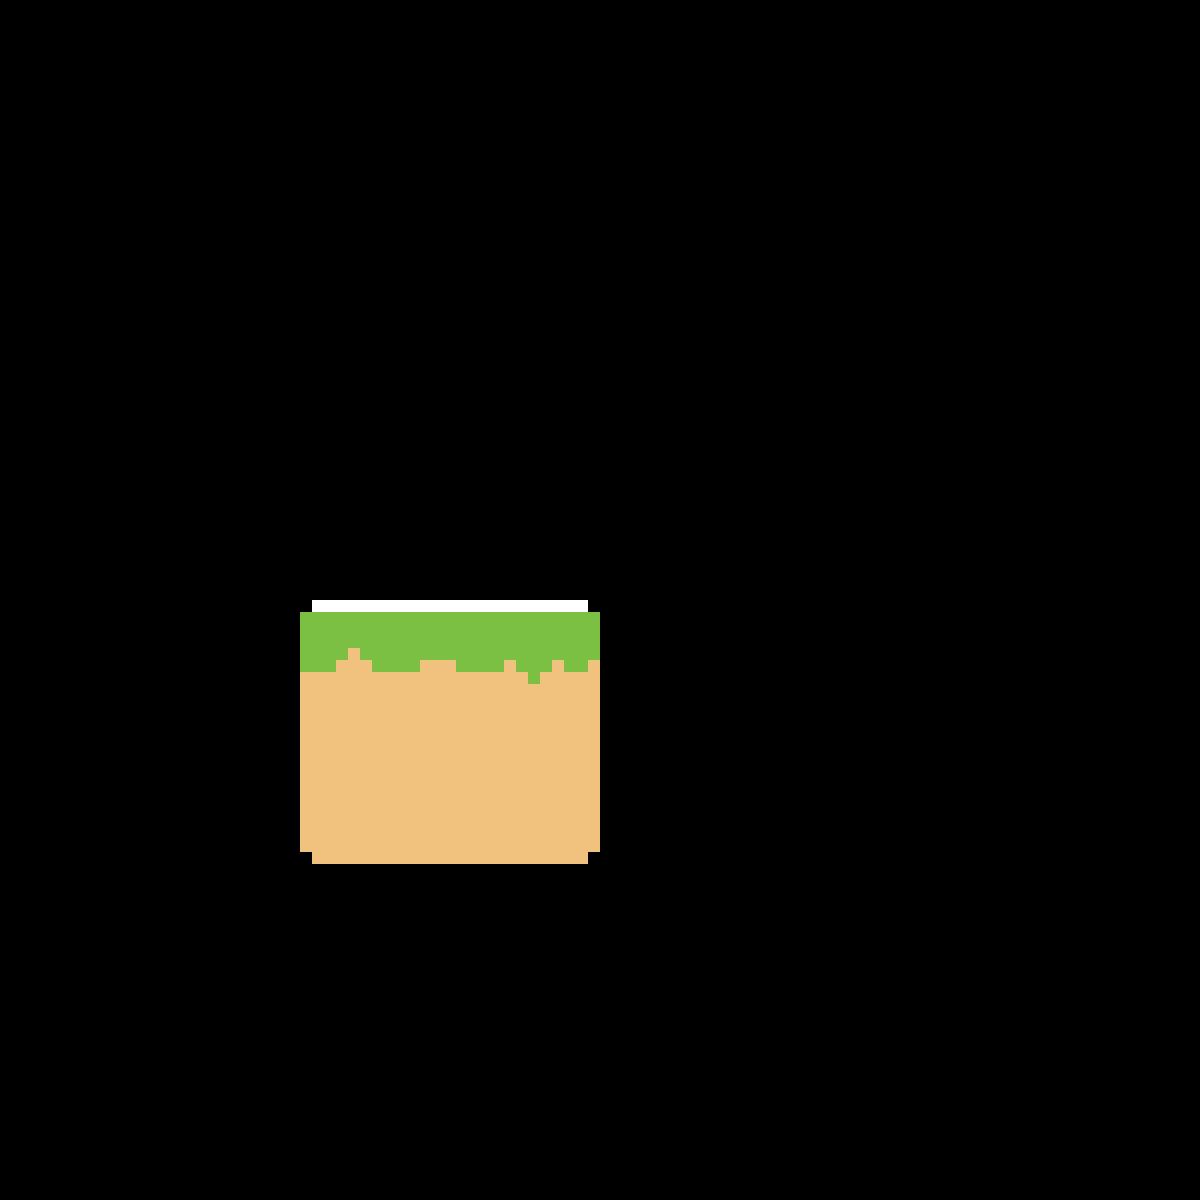 grass block by grashilikemerch